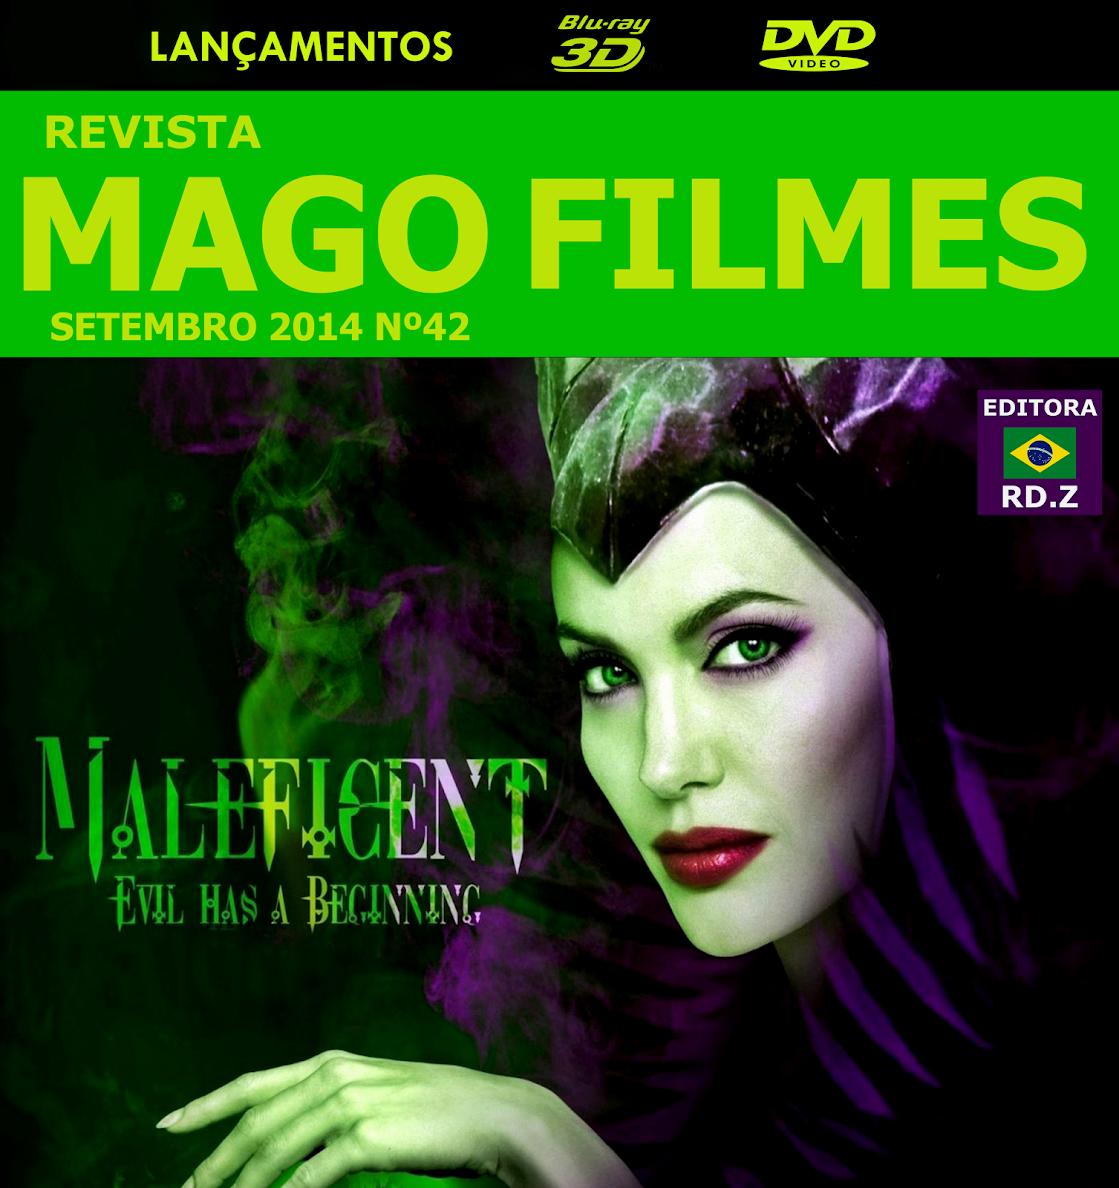 Revista Mago Filmes RD.Z